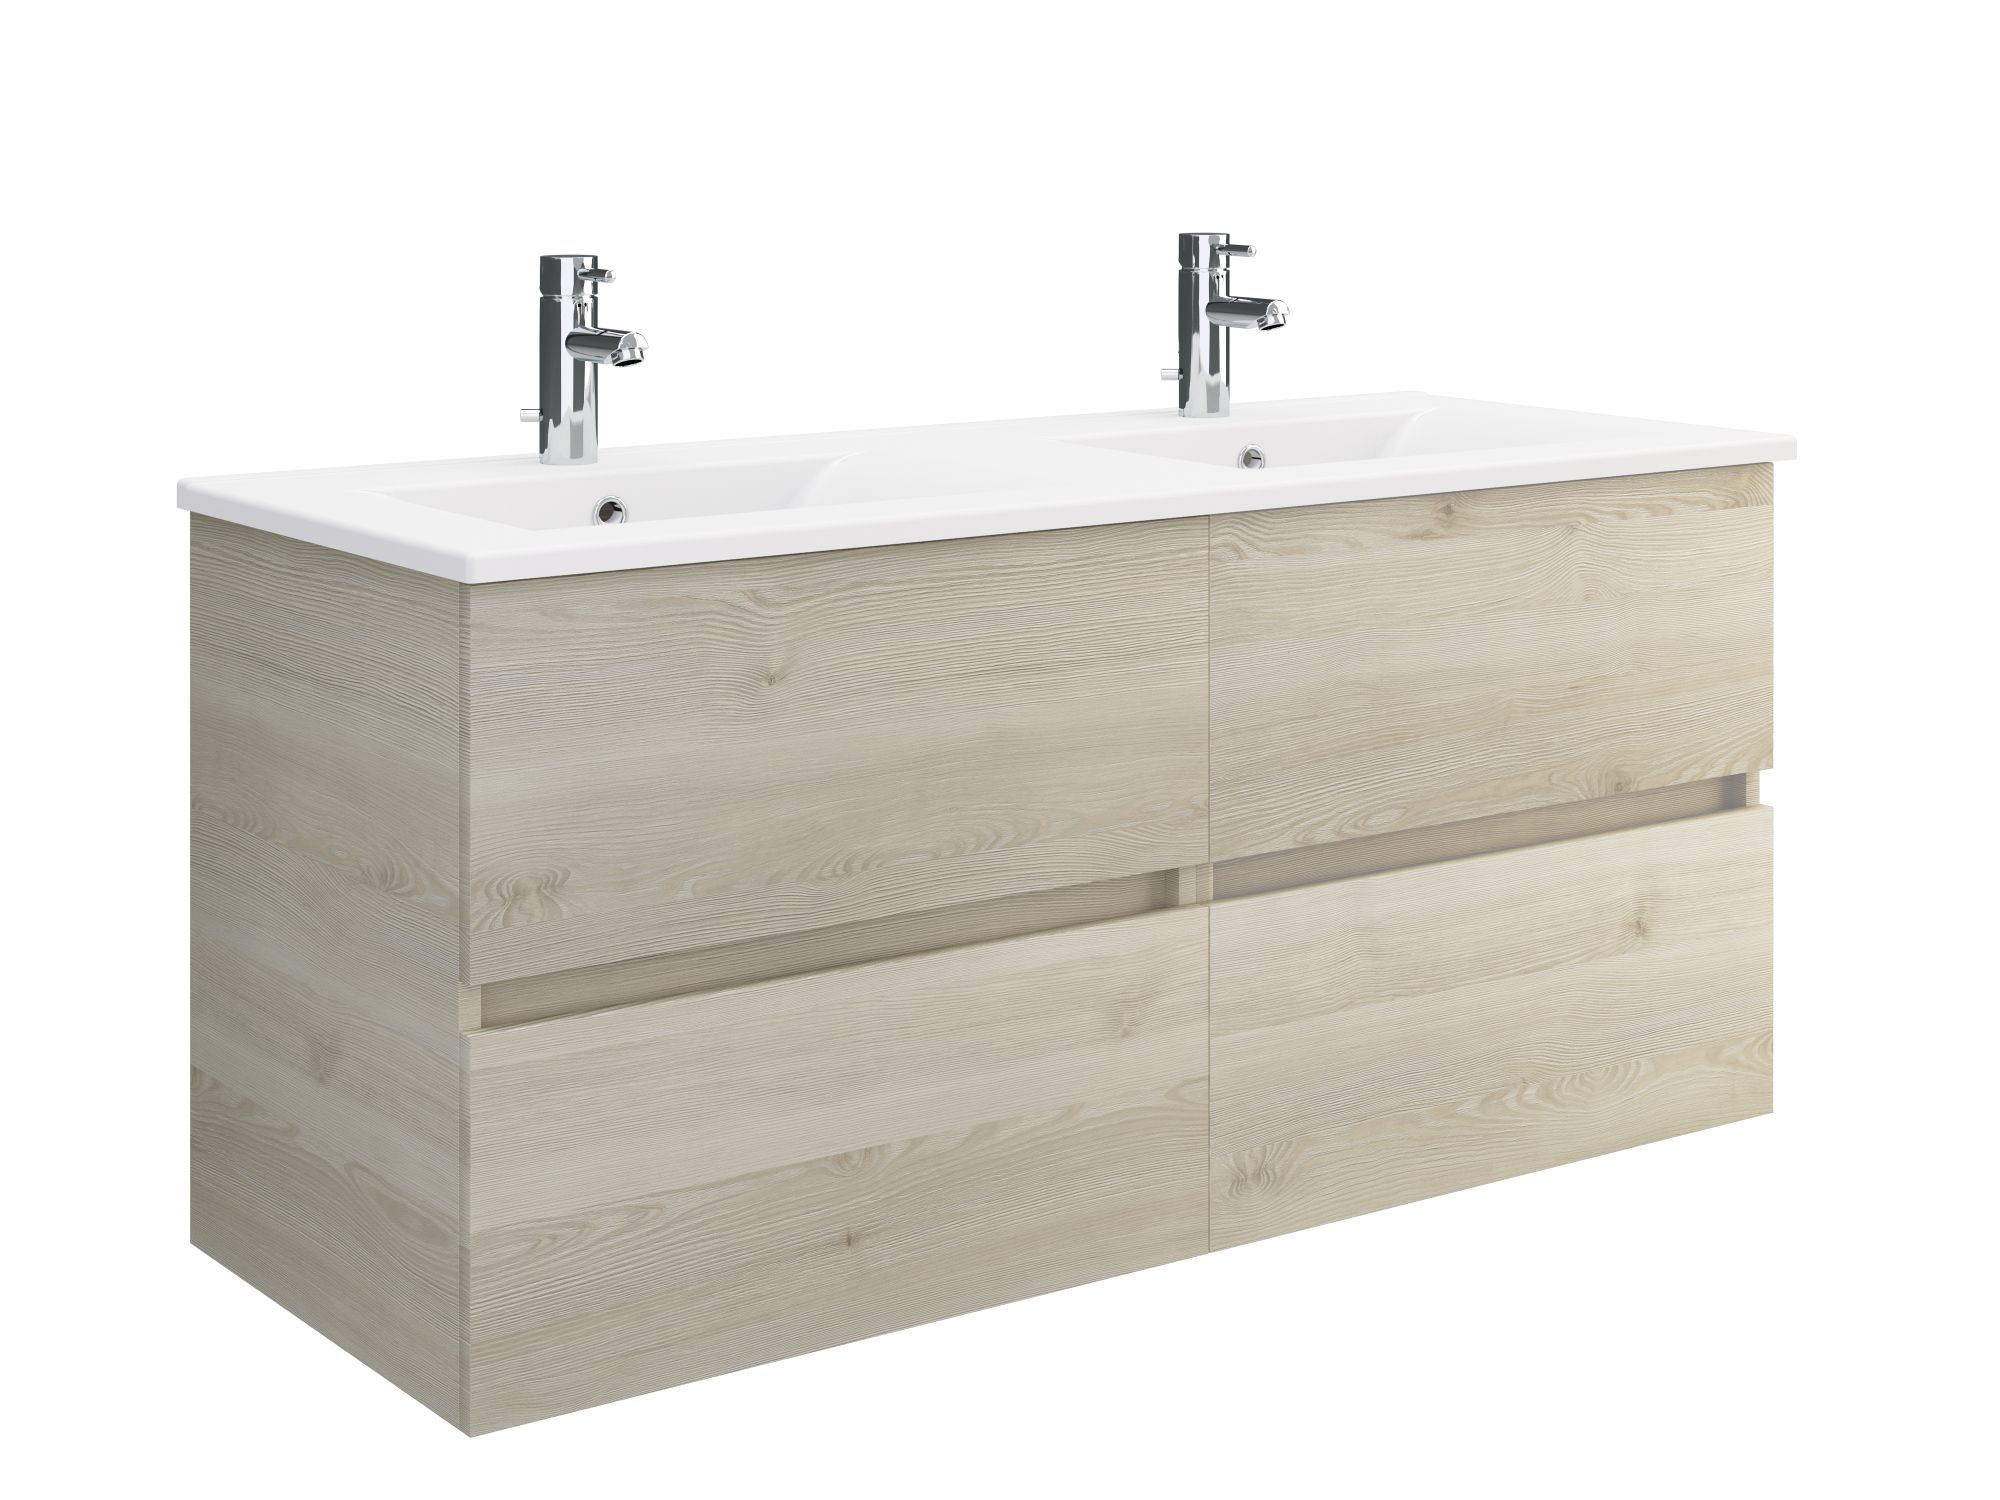 imágenes 3D mueble baño